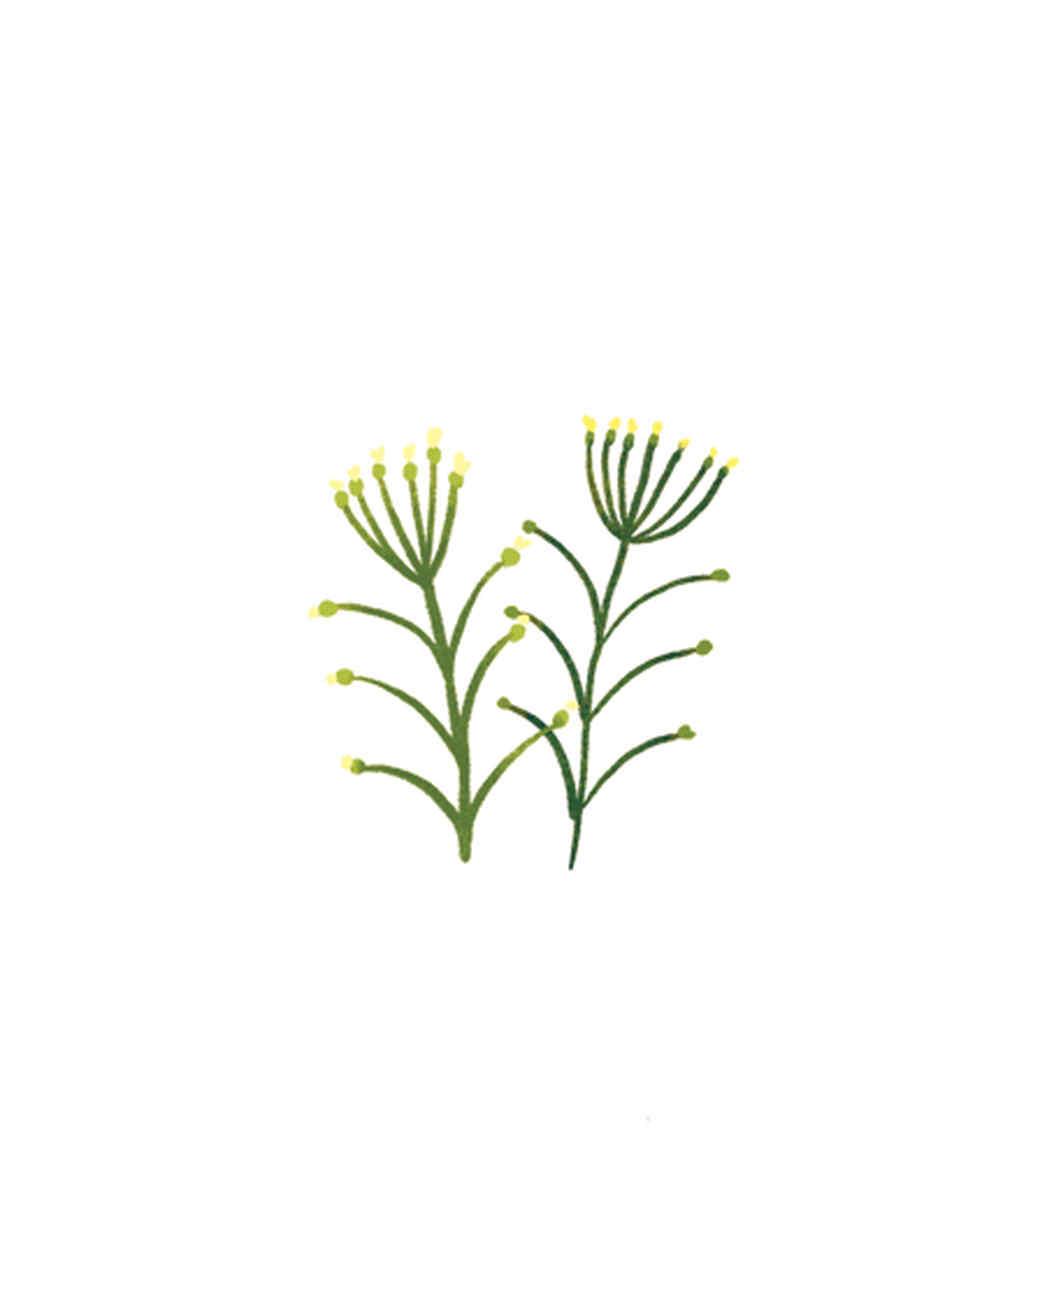 essential-oils-illustration-10.jpg